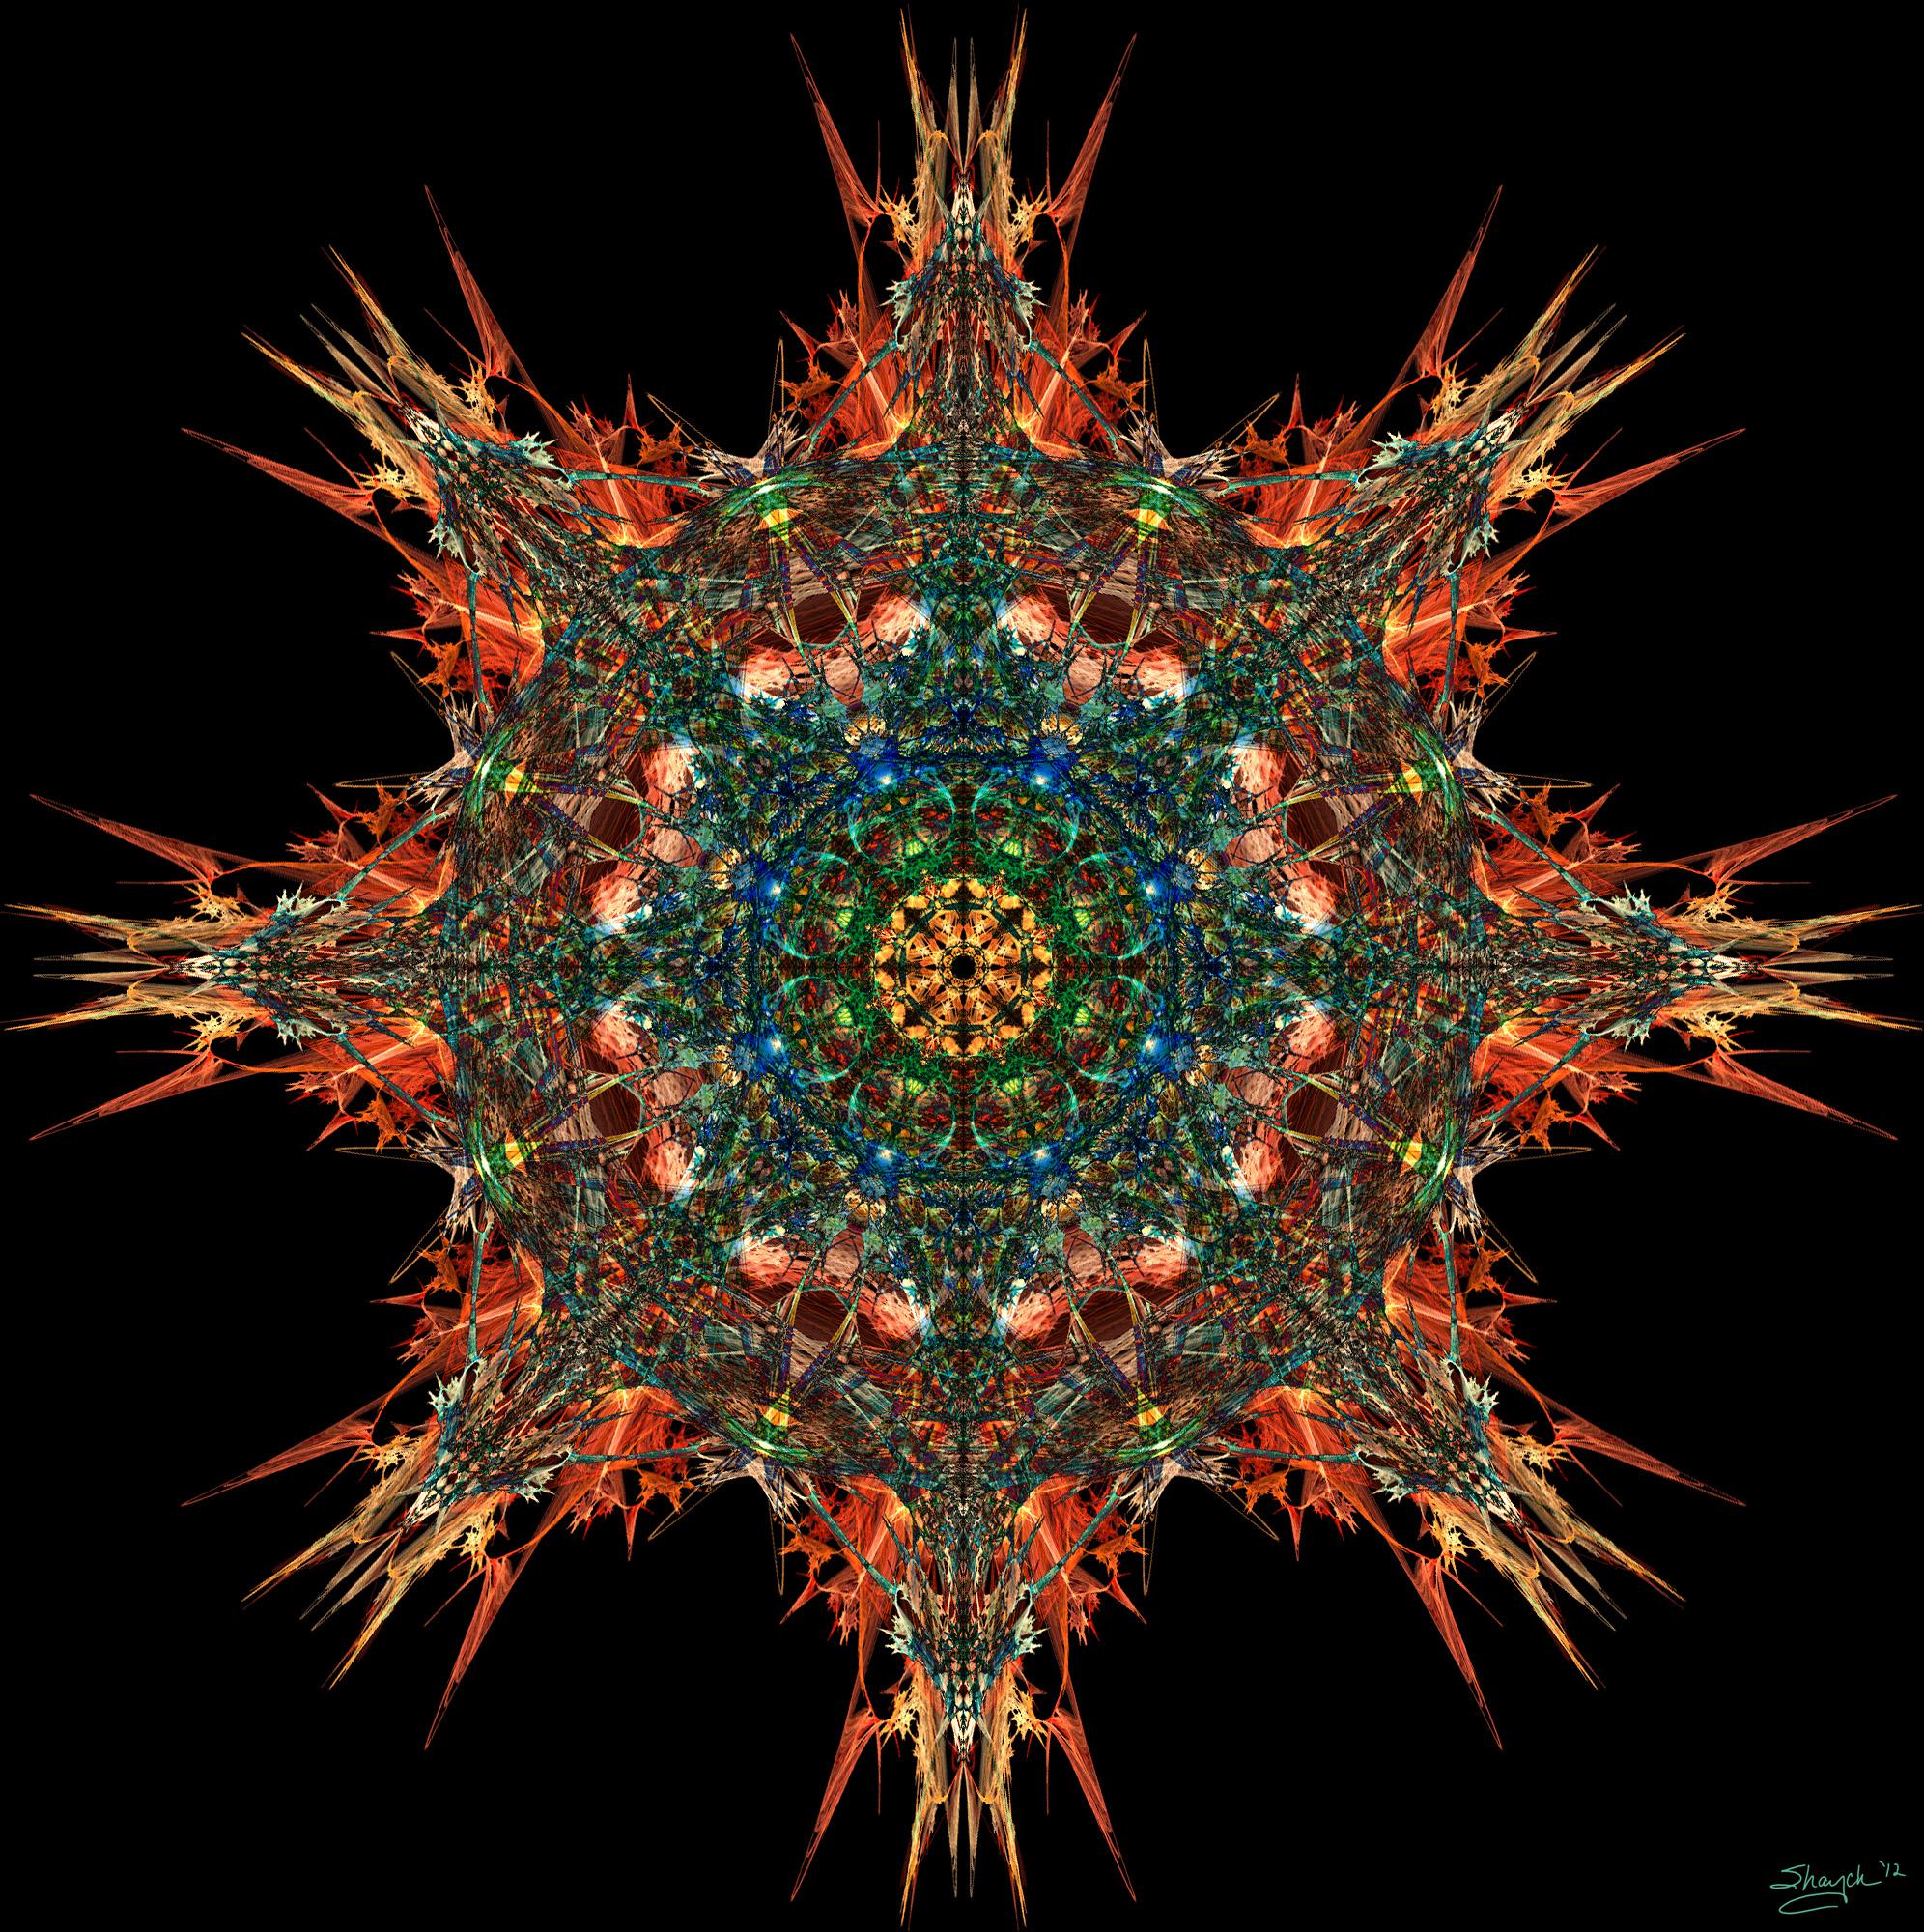 Chaos dragon mandala by shaych03 on deviantart - Mandala de dragon ...